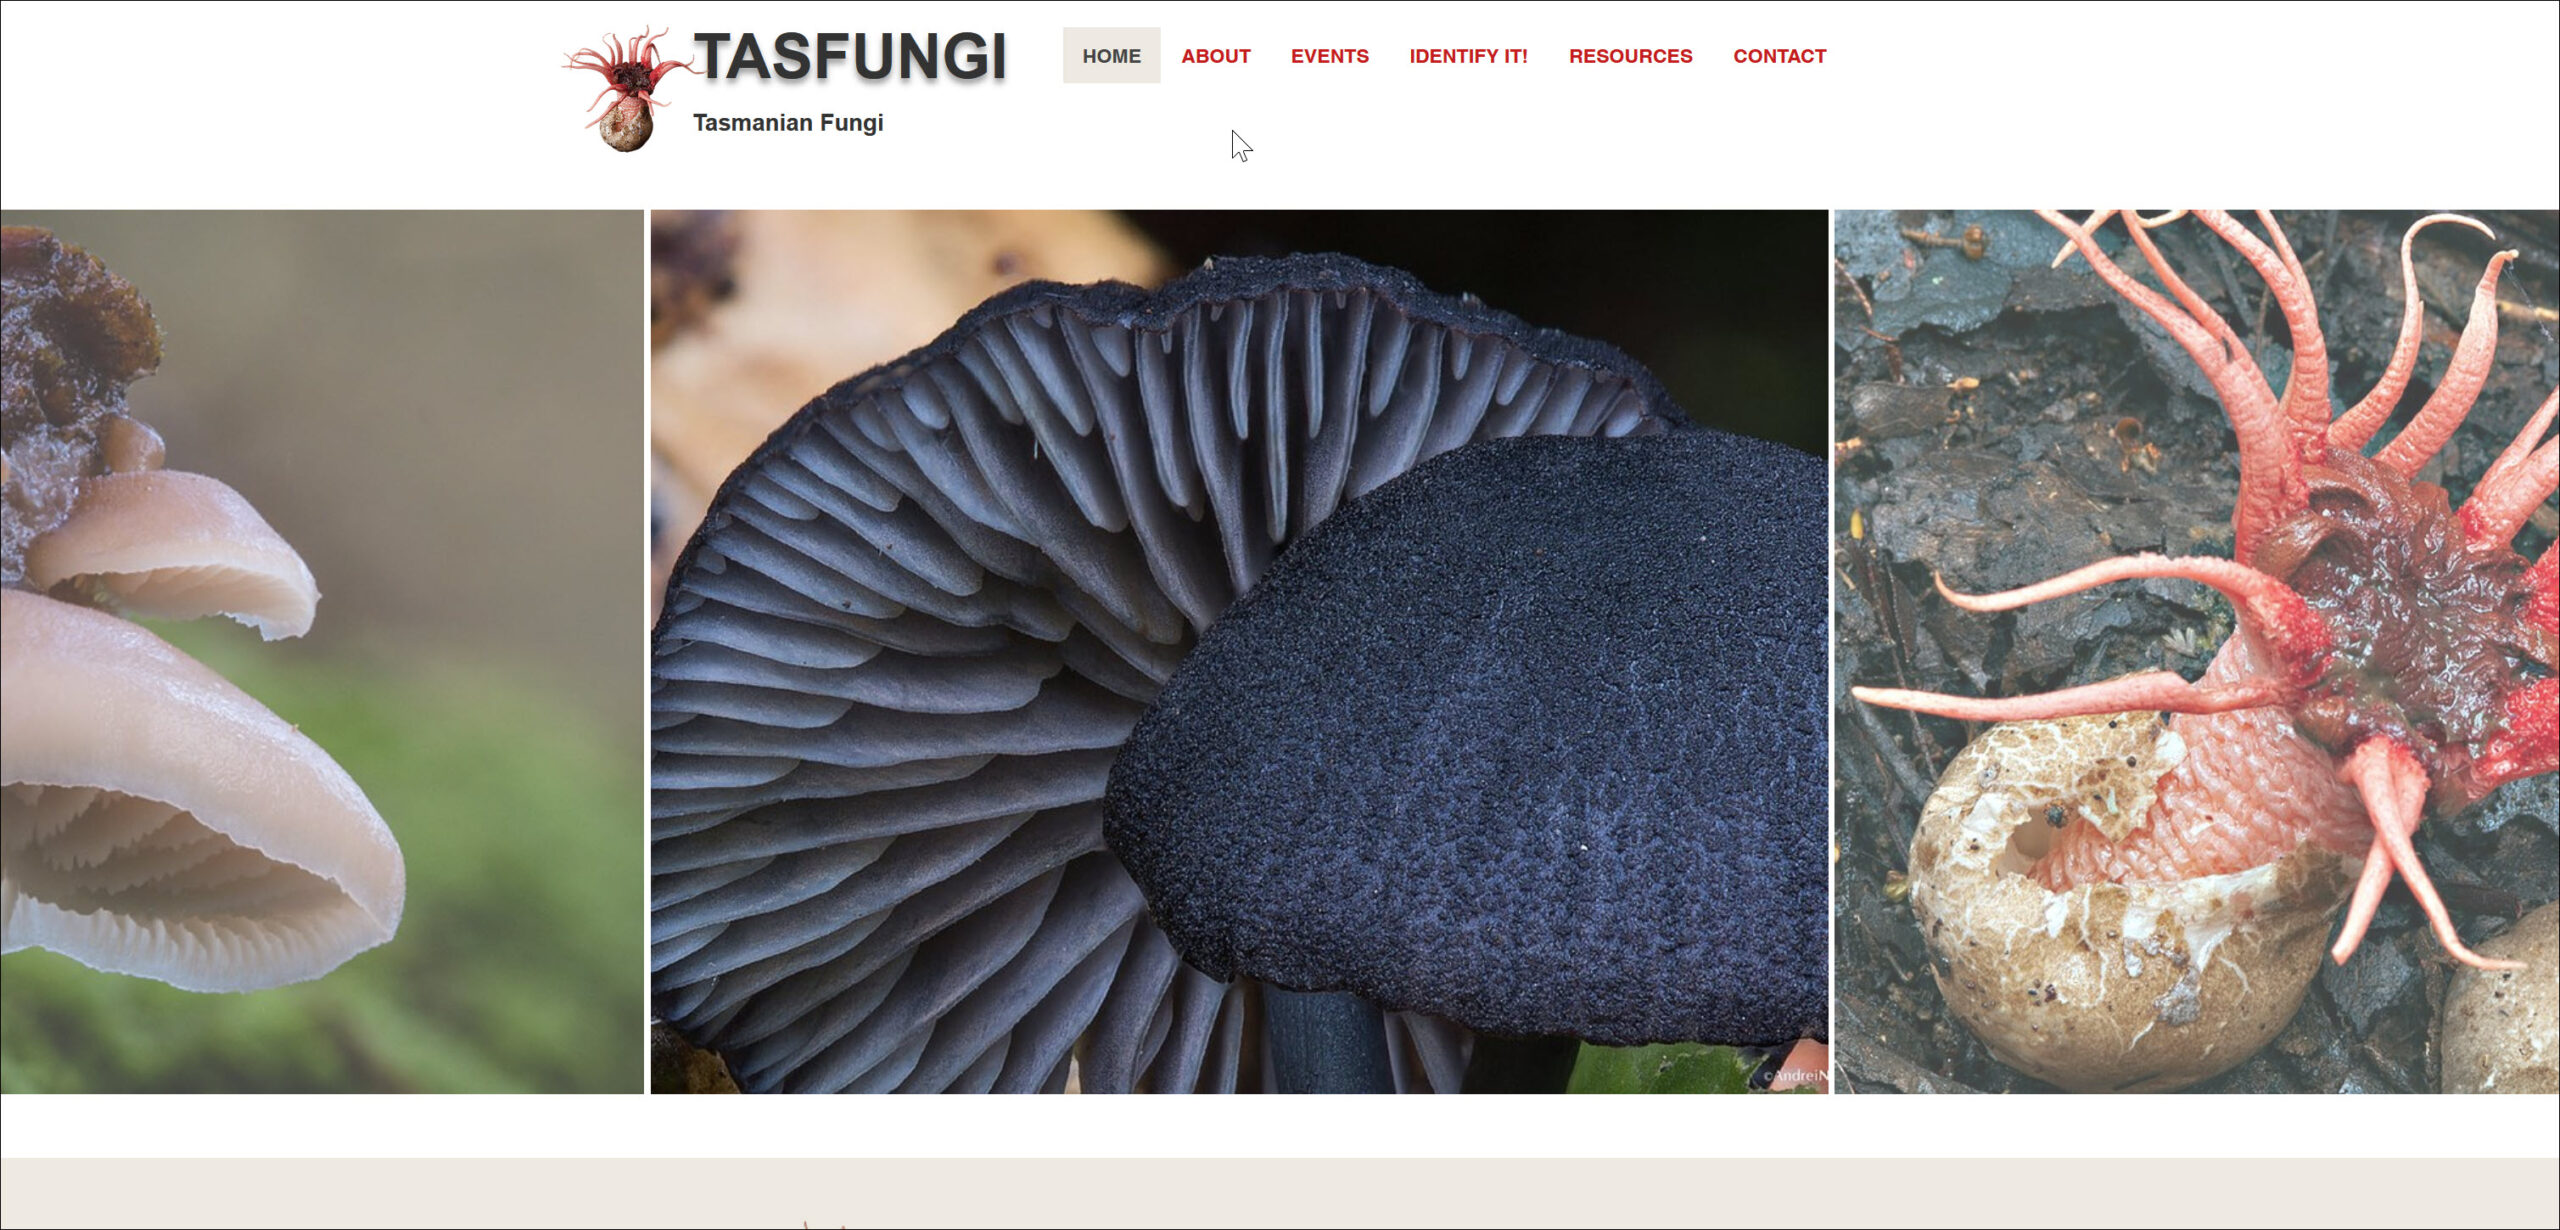 Tasfungi website Book Cover